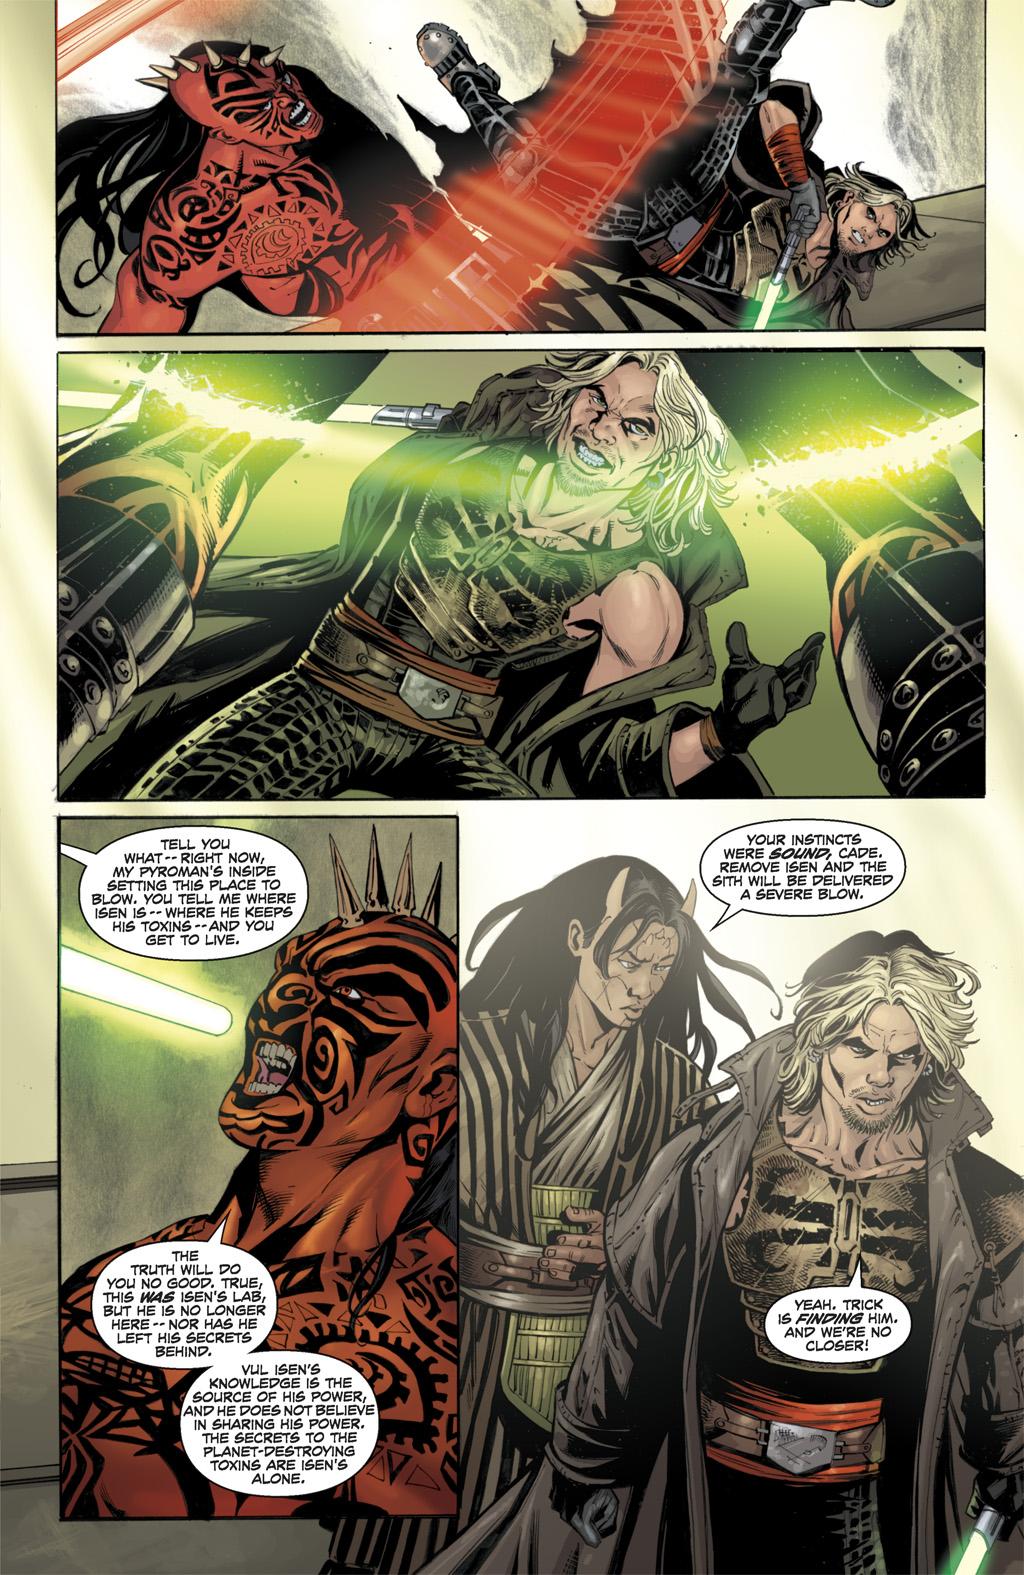 Cade Skywalker Shows No Mercy To A Sith